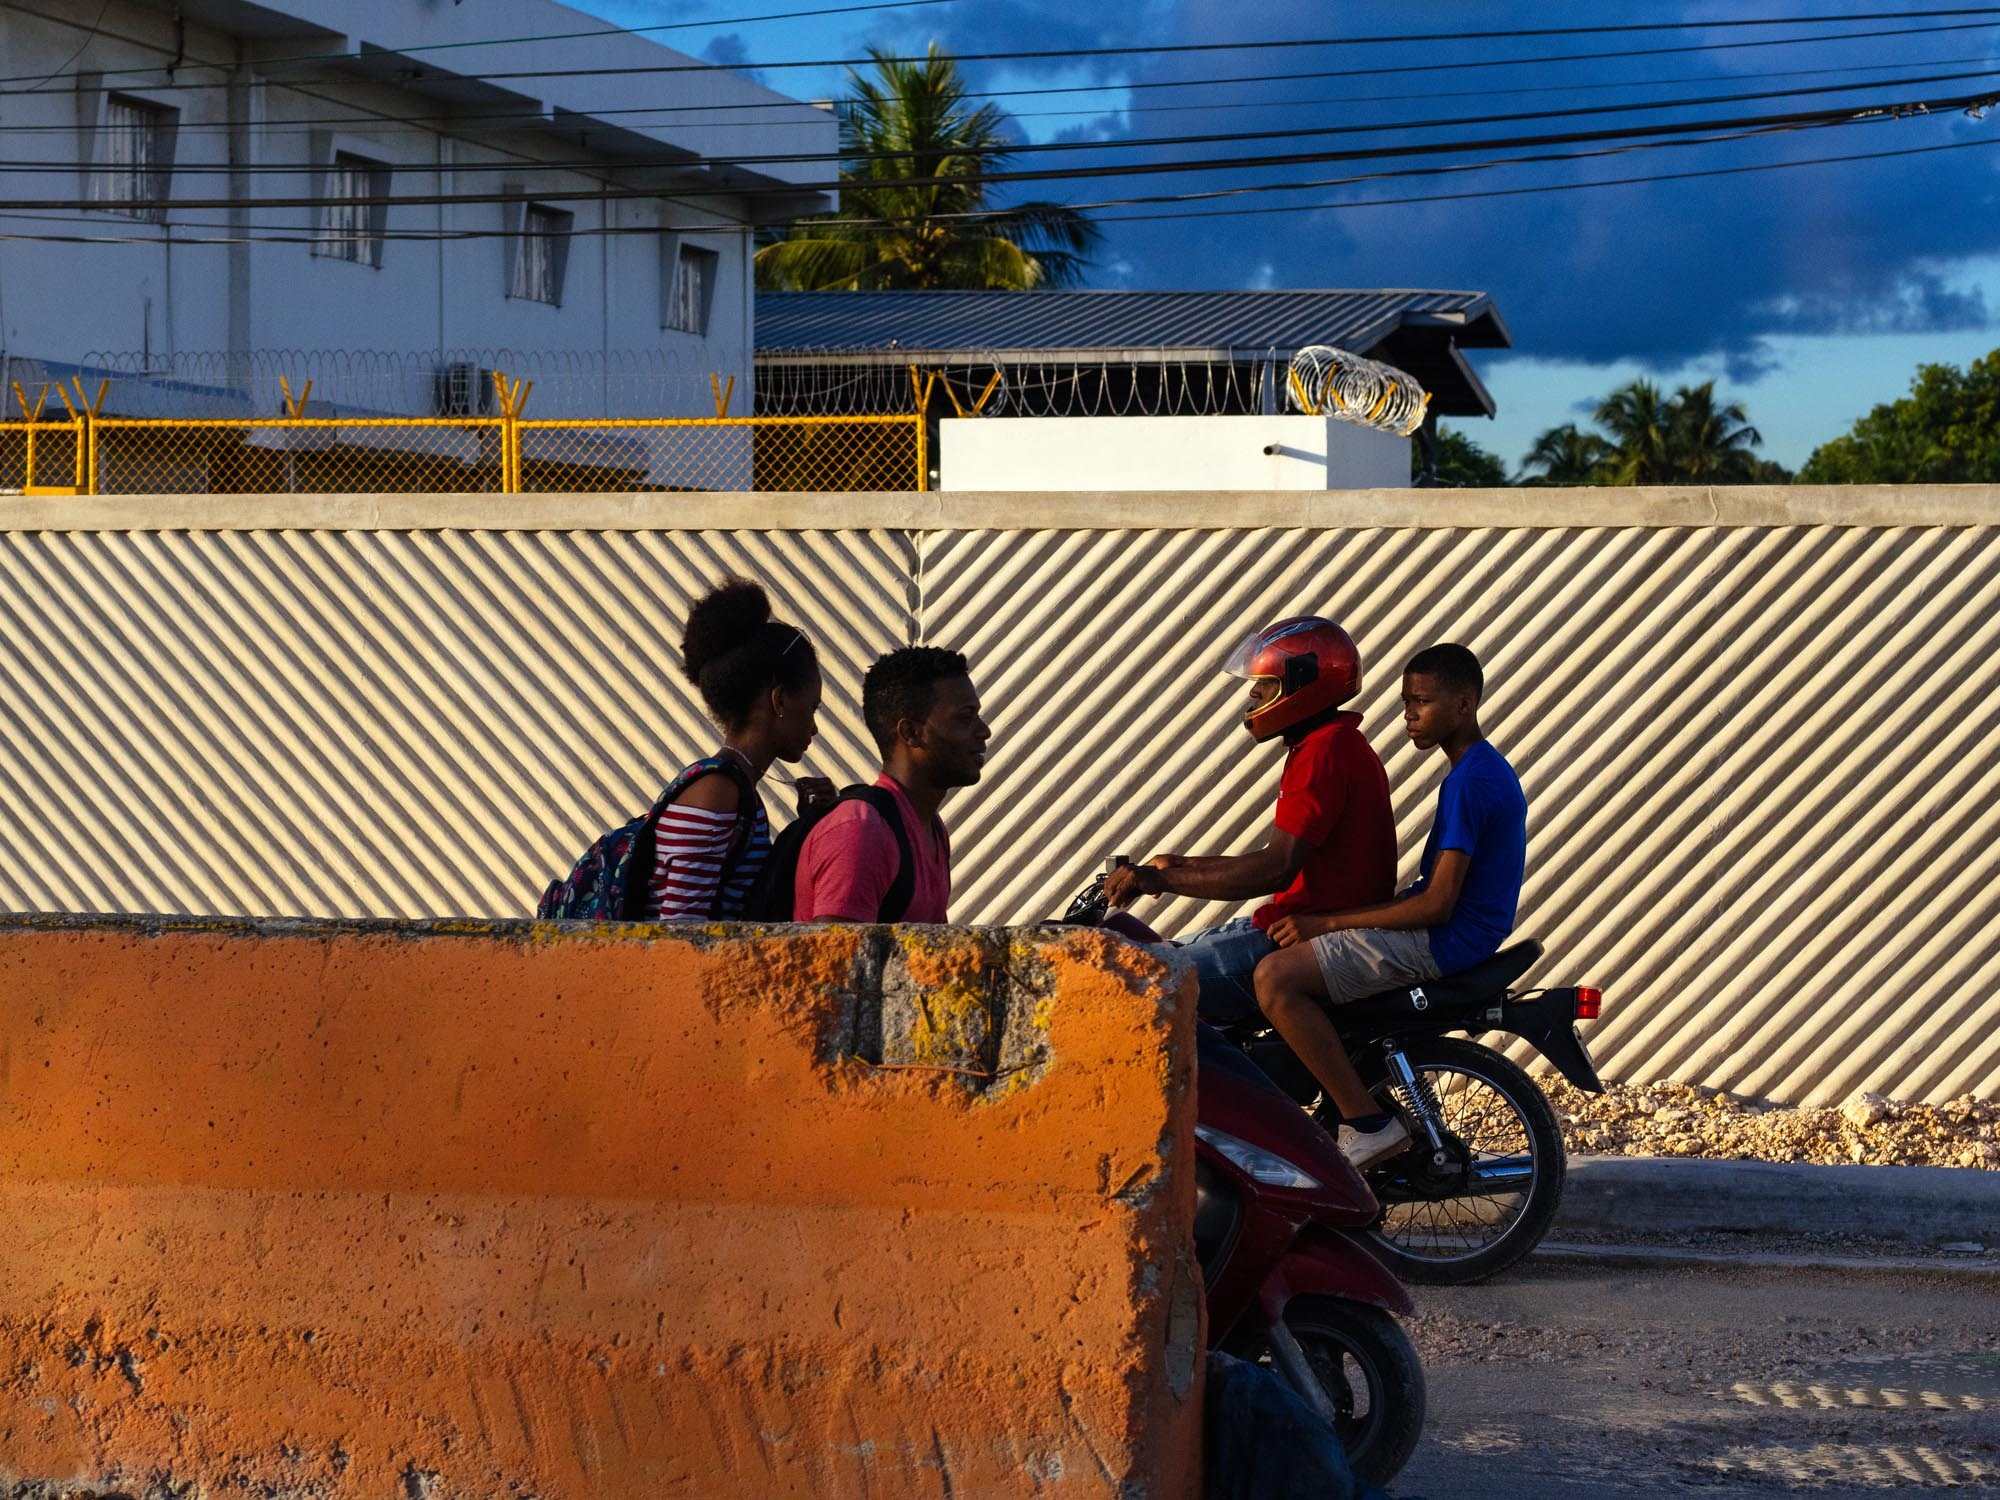 joris-hermans-photography-postcards-dominican-republic-four.jpg